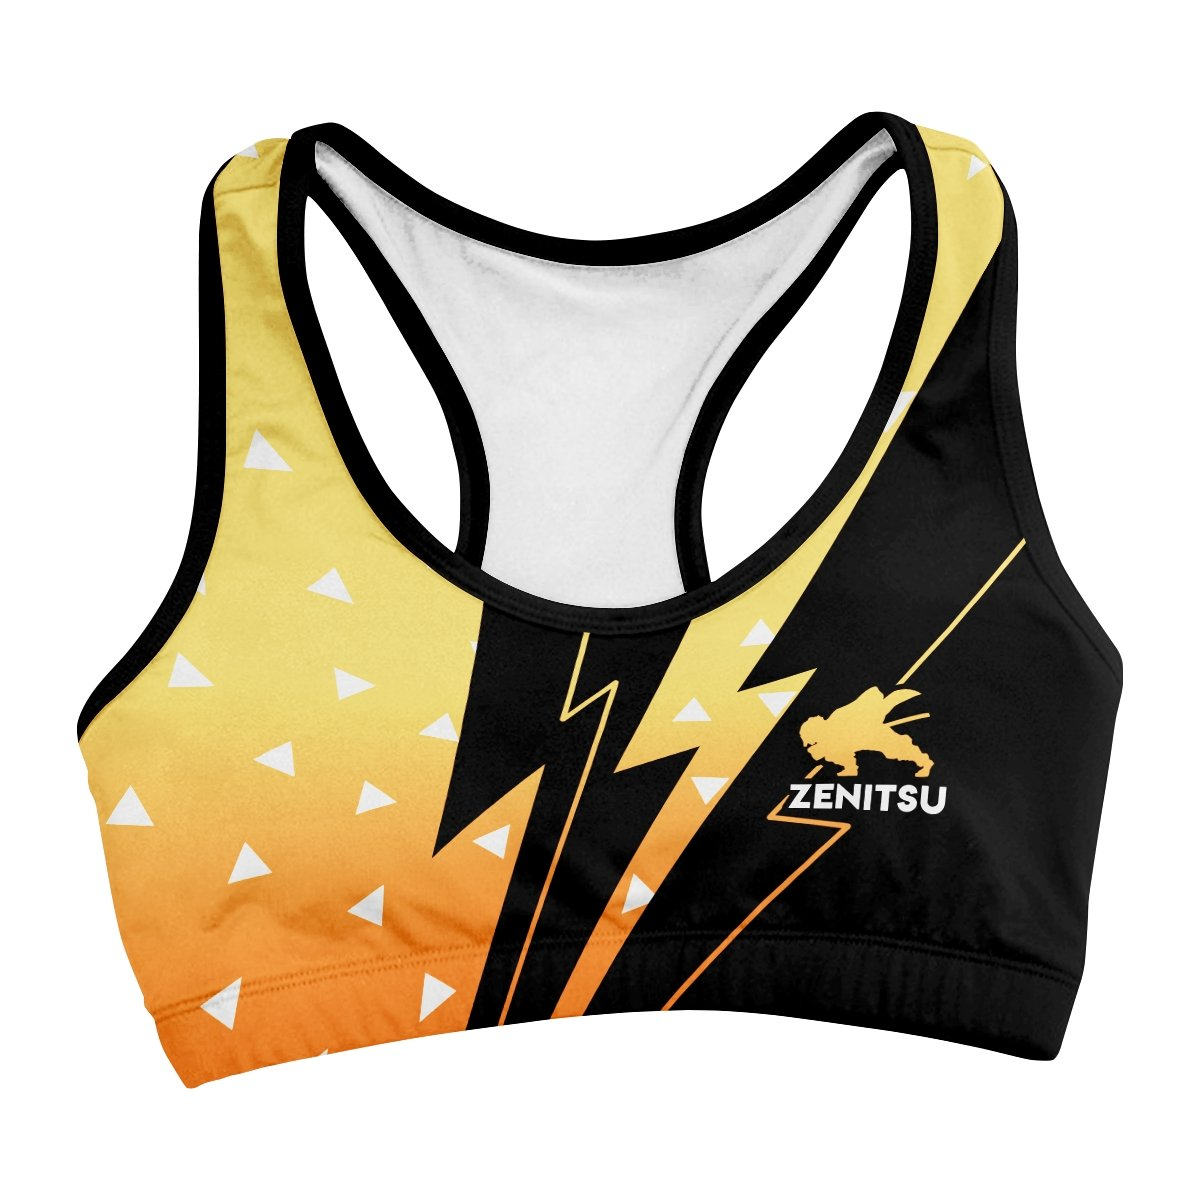 summer zenitsu active wear set 625732 - Anime Swimsuits